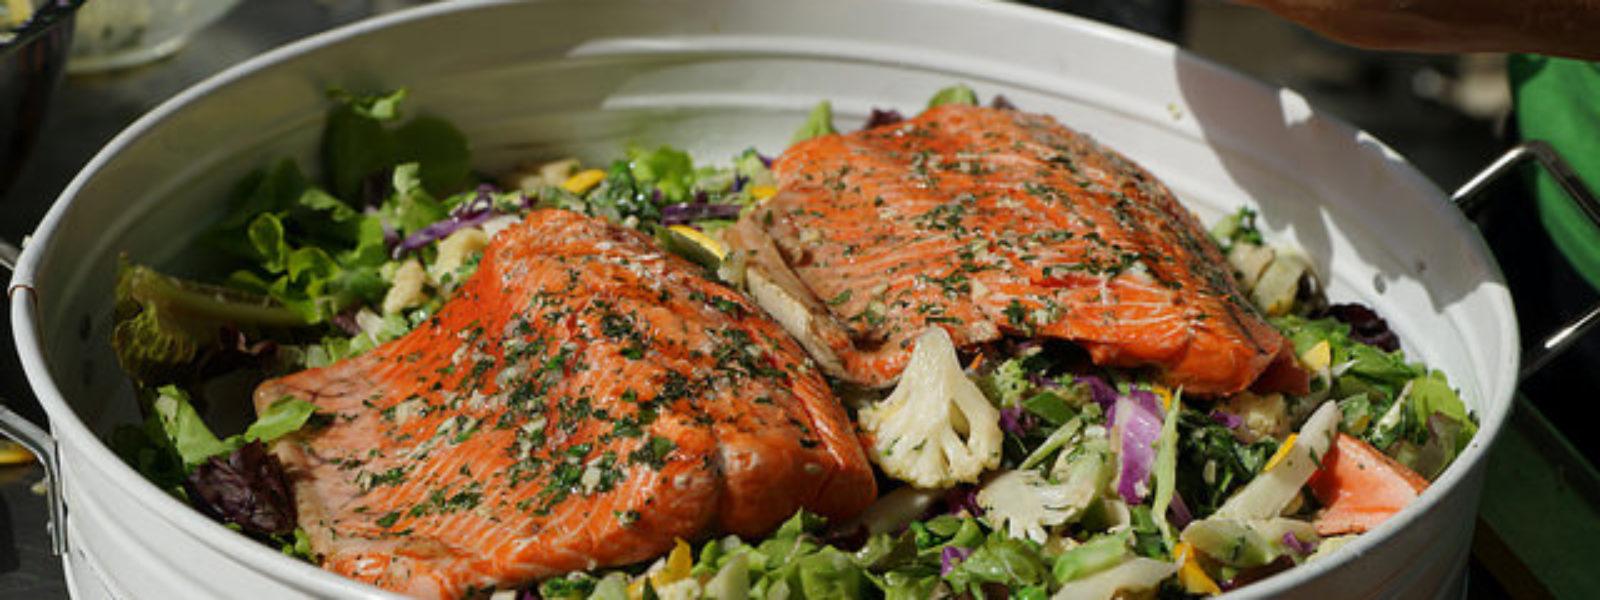 Garlic Rubbed Salmon Fish healthy fat